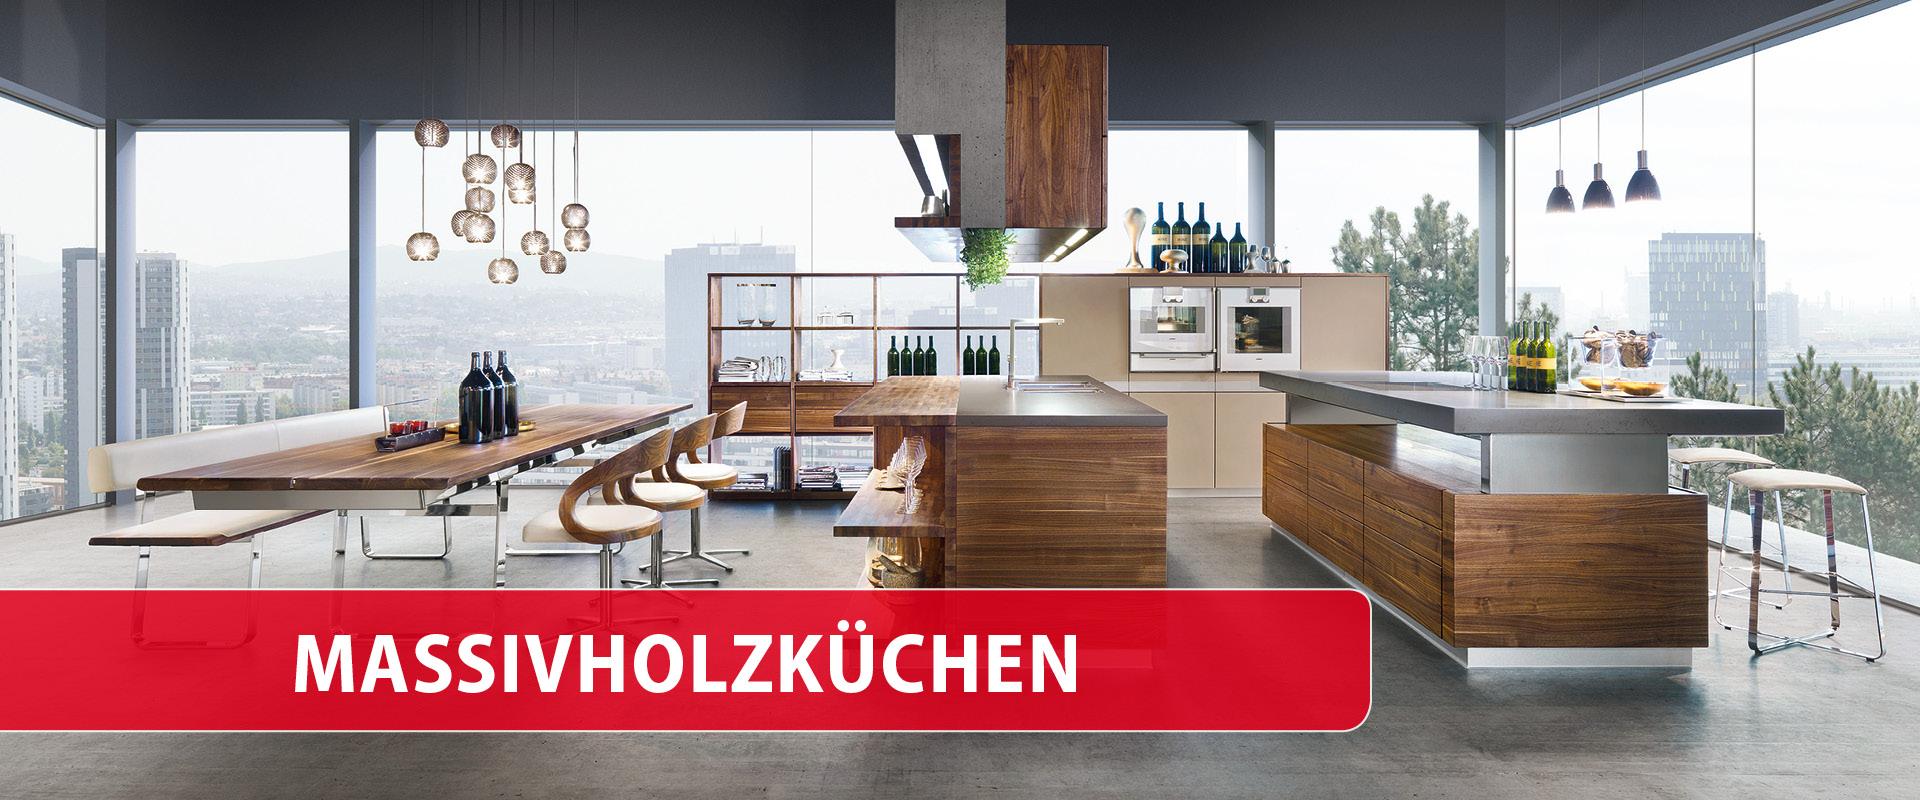 Full Size of Massivholzküche Aufarbeiten Massivholzküche Schweiz Massivholzküchen Deutschland Massivholzküche Allnatura Küche Massivholzküche